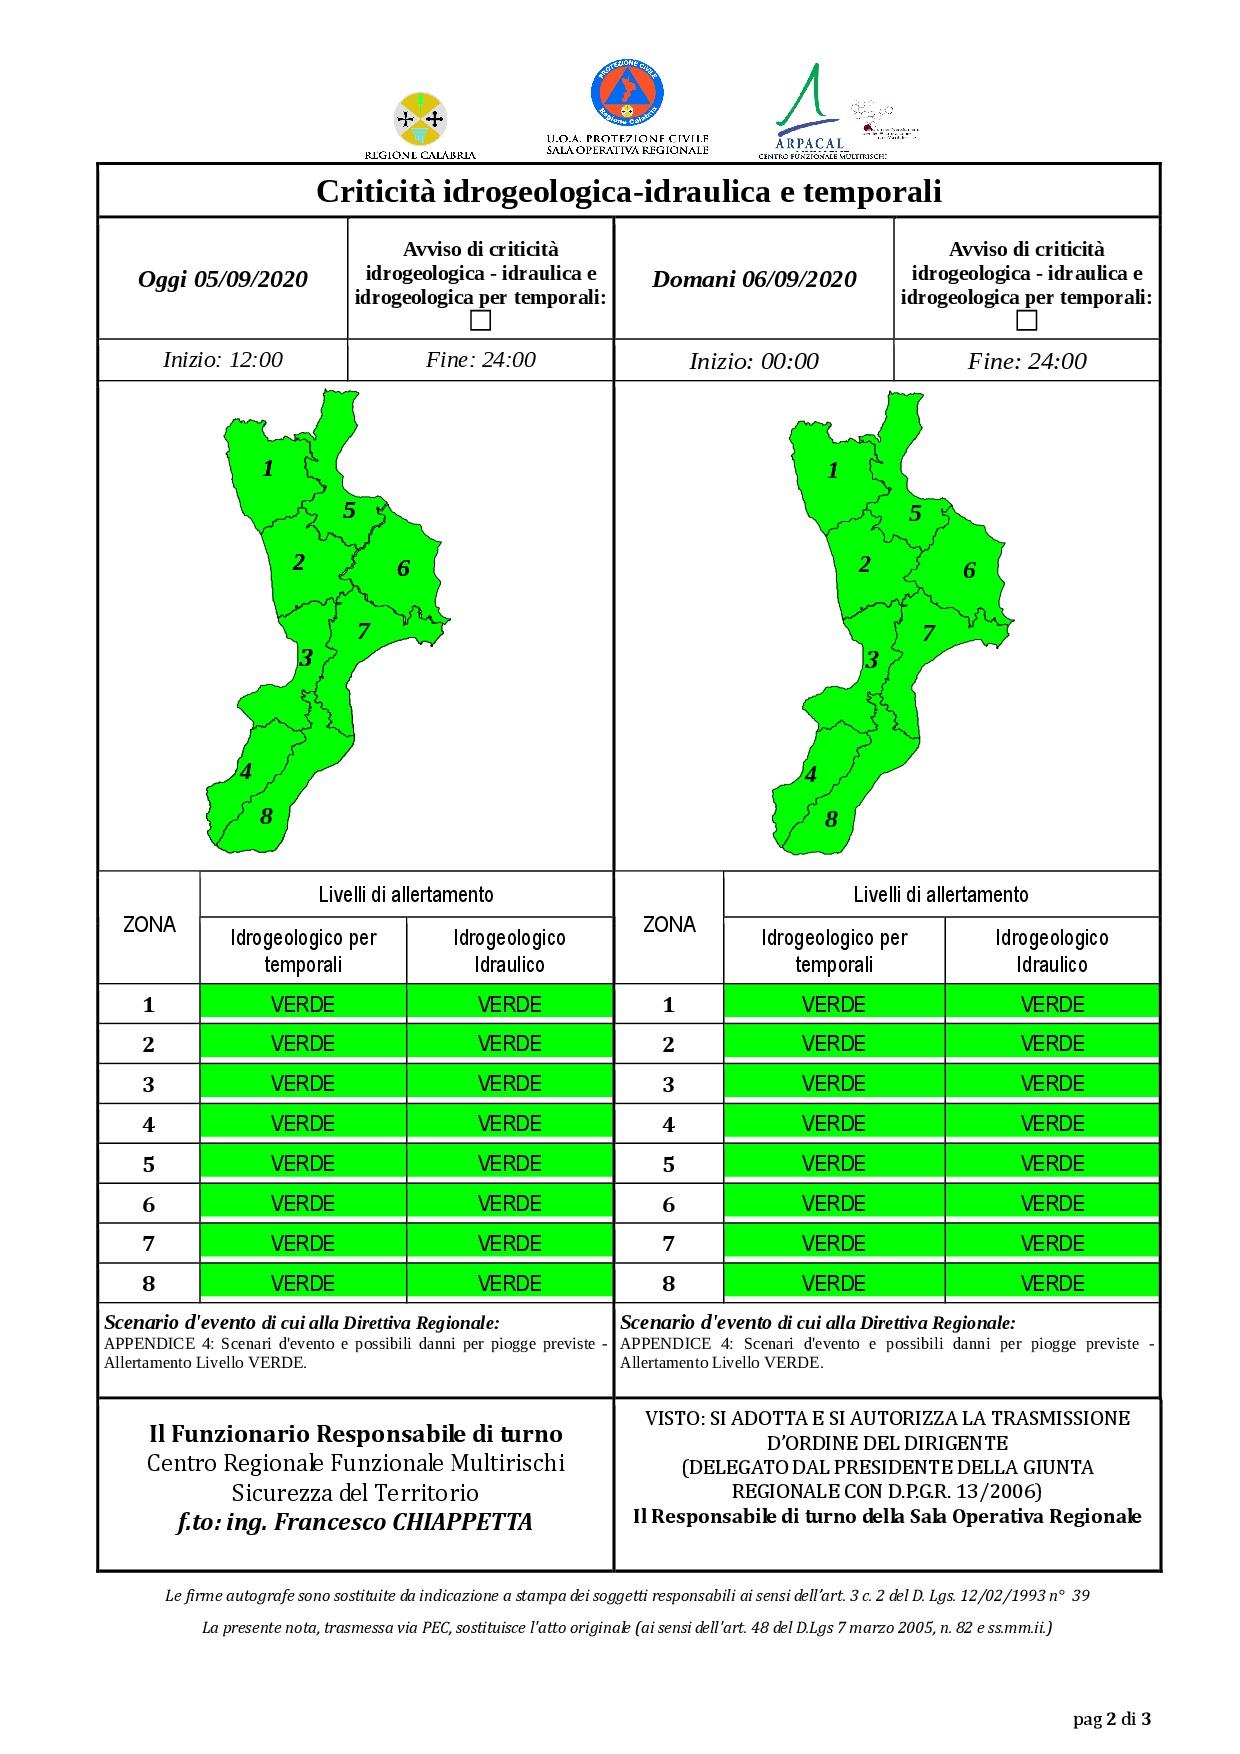 Criticità idrogeologica-idraulica e temporali in Calabria 05-09-2020